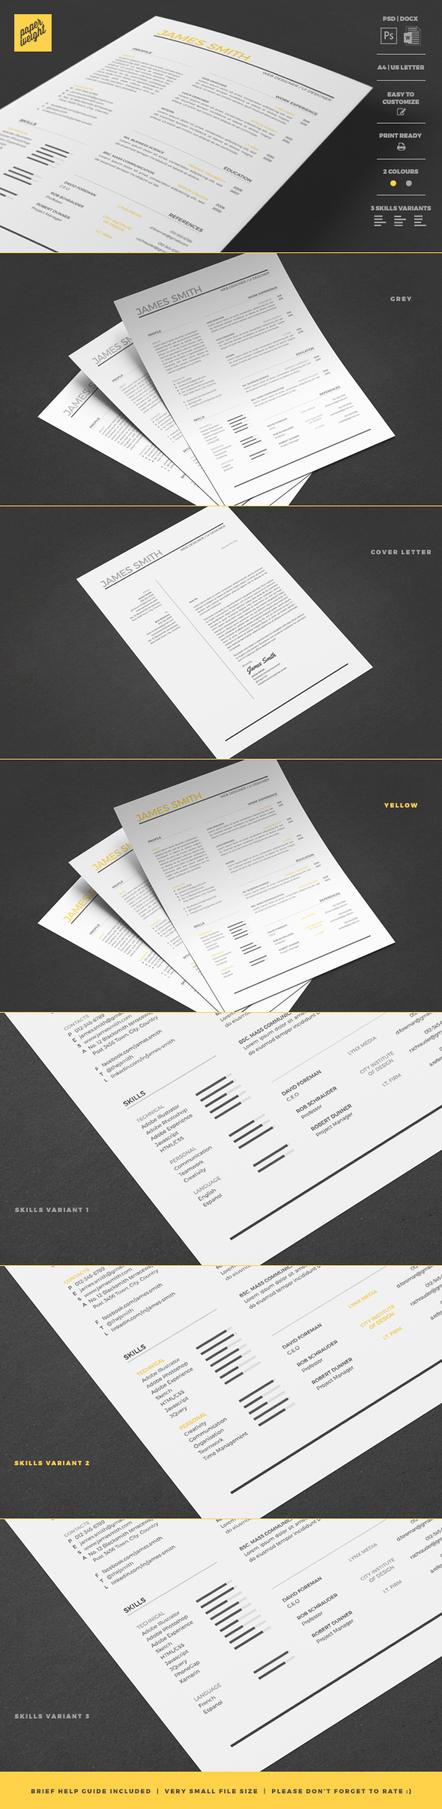 Resume CV Curriculum Vitae Template by CaJoE-Design